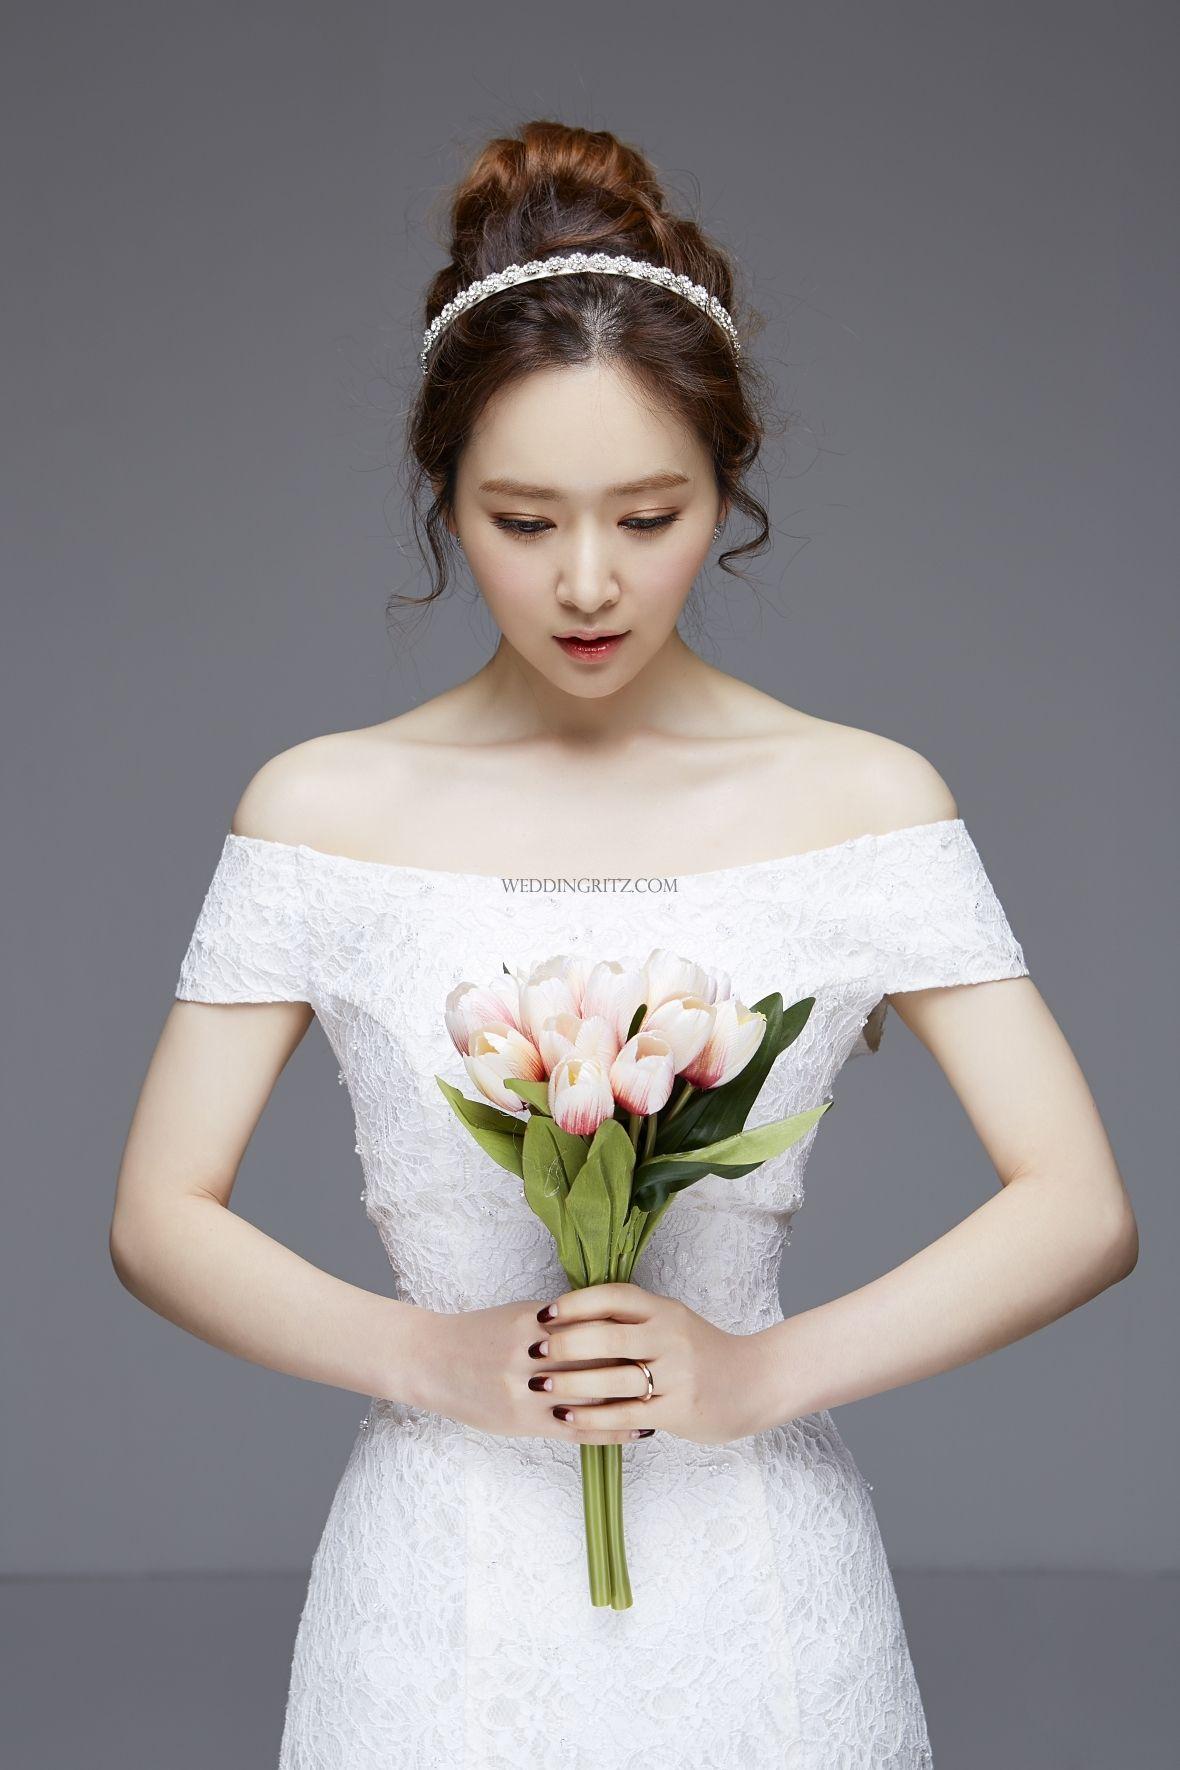 2b6525be77bfeed7188d45d61950bd2e.jpg (1180×1770) Bride